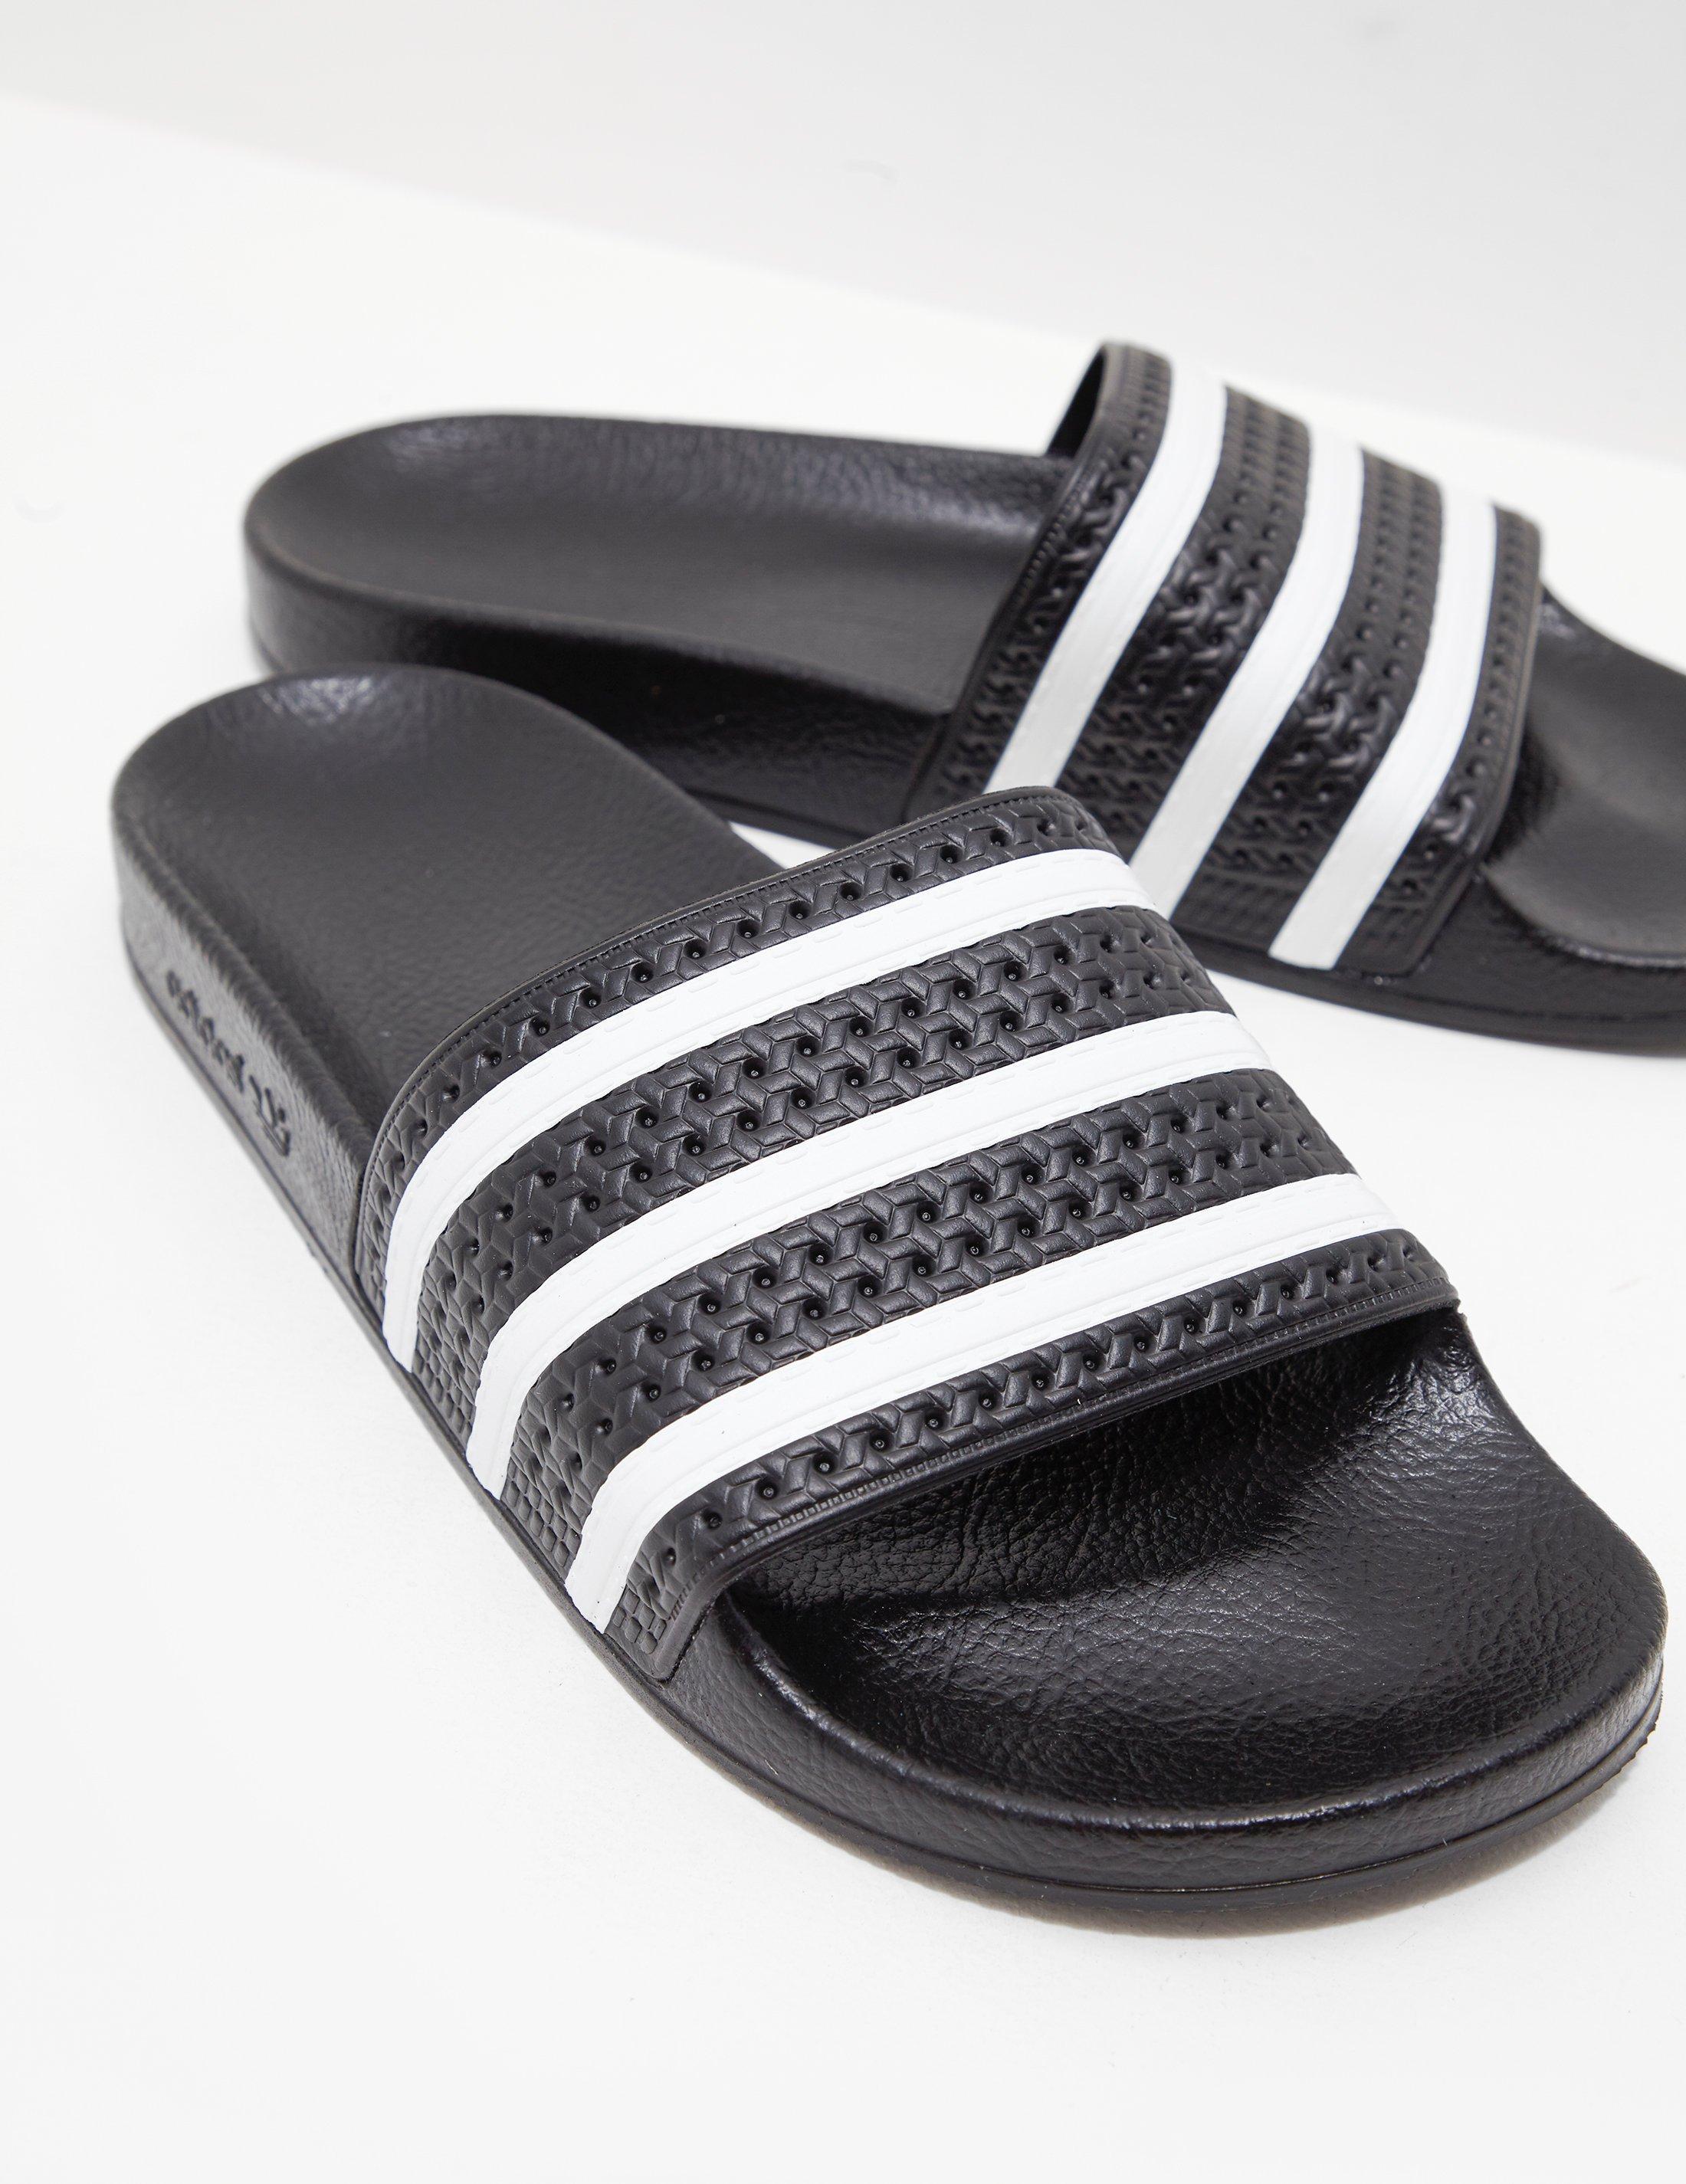 adefb3f9d7a414 Adidas Originals - Adilette Slides Black for Men - Lyst. View fullscreen